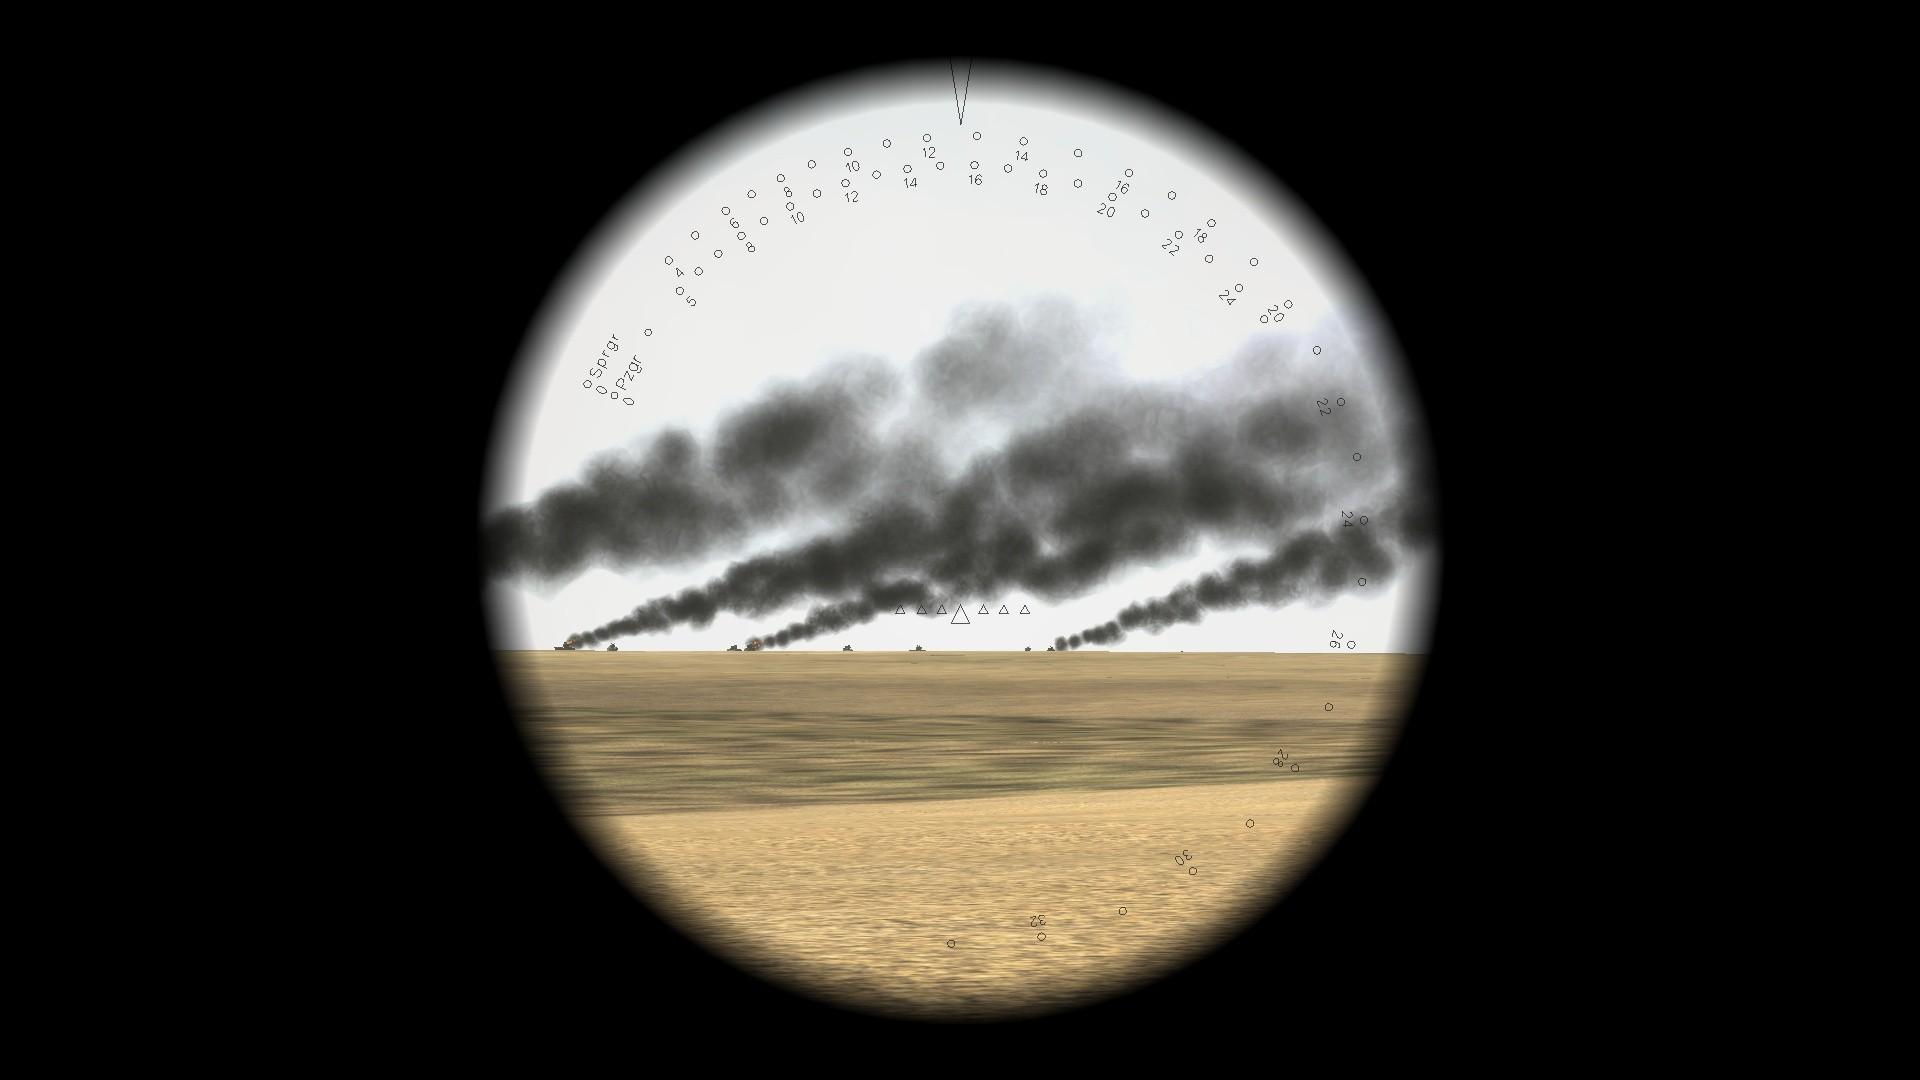 JCGM (Japan Community Game Pack) Smoke_on_the_Horizon